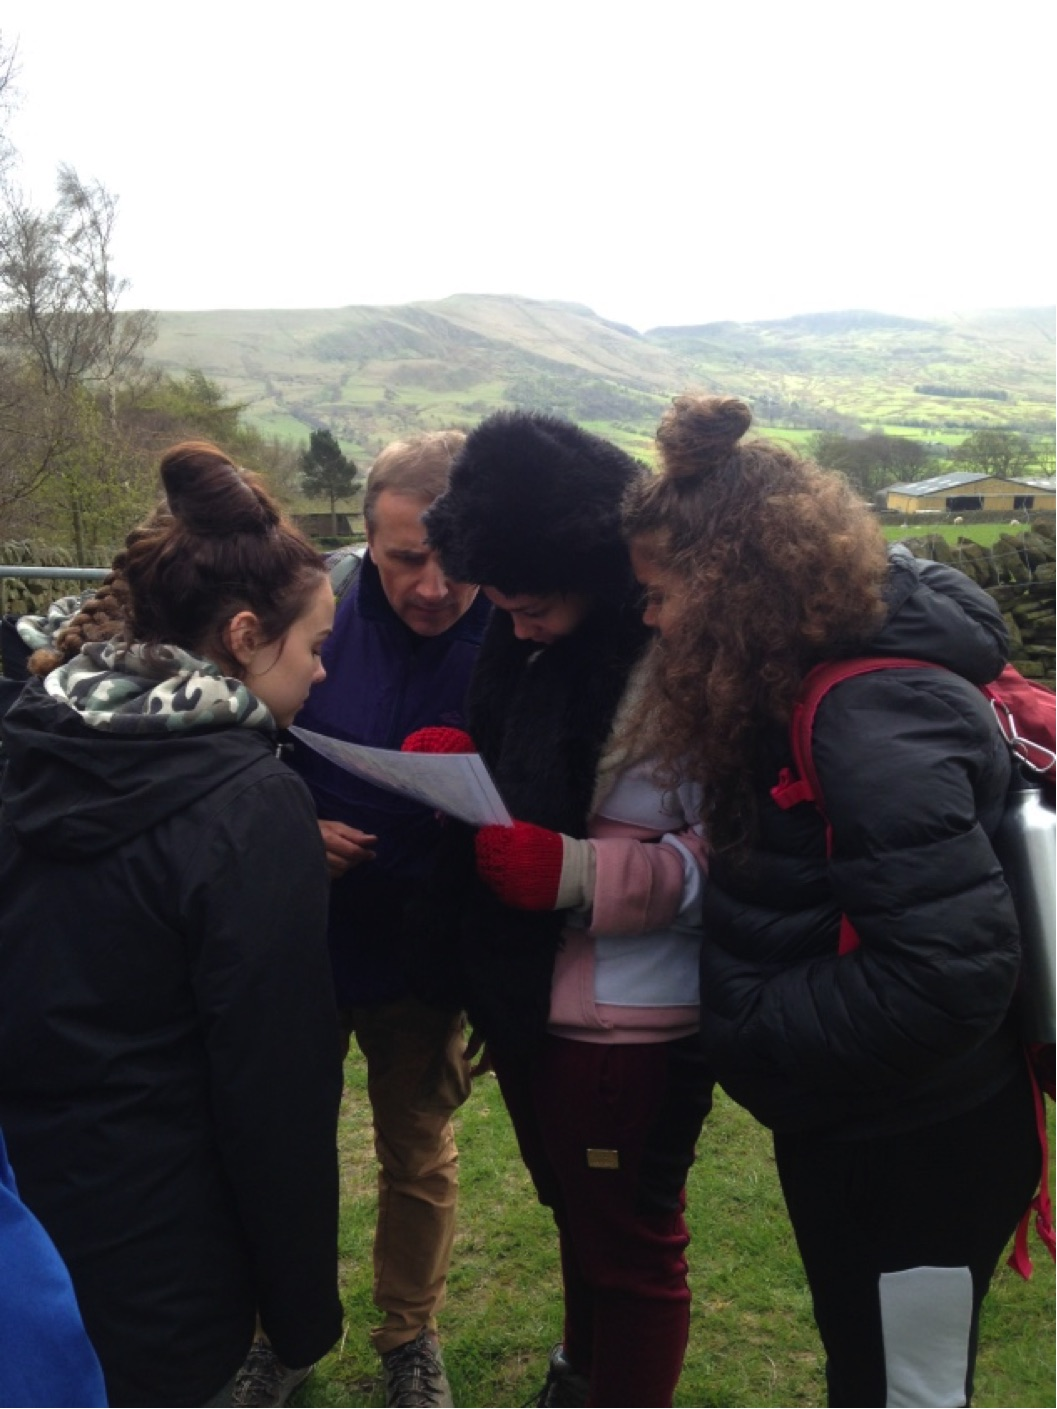 Duke of Edinburgh group look at their map